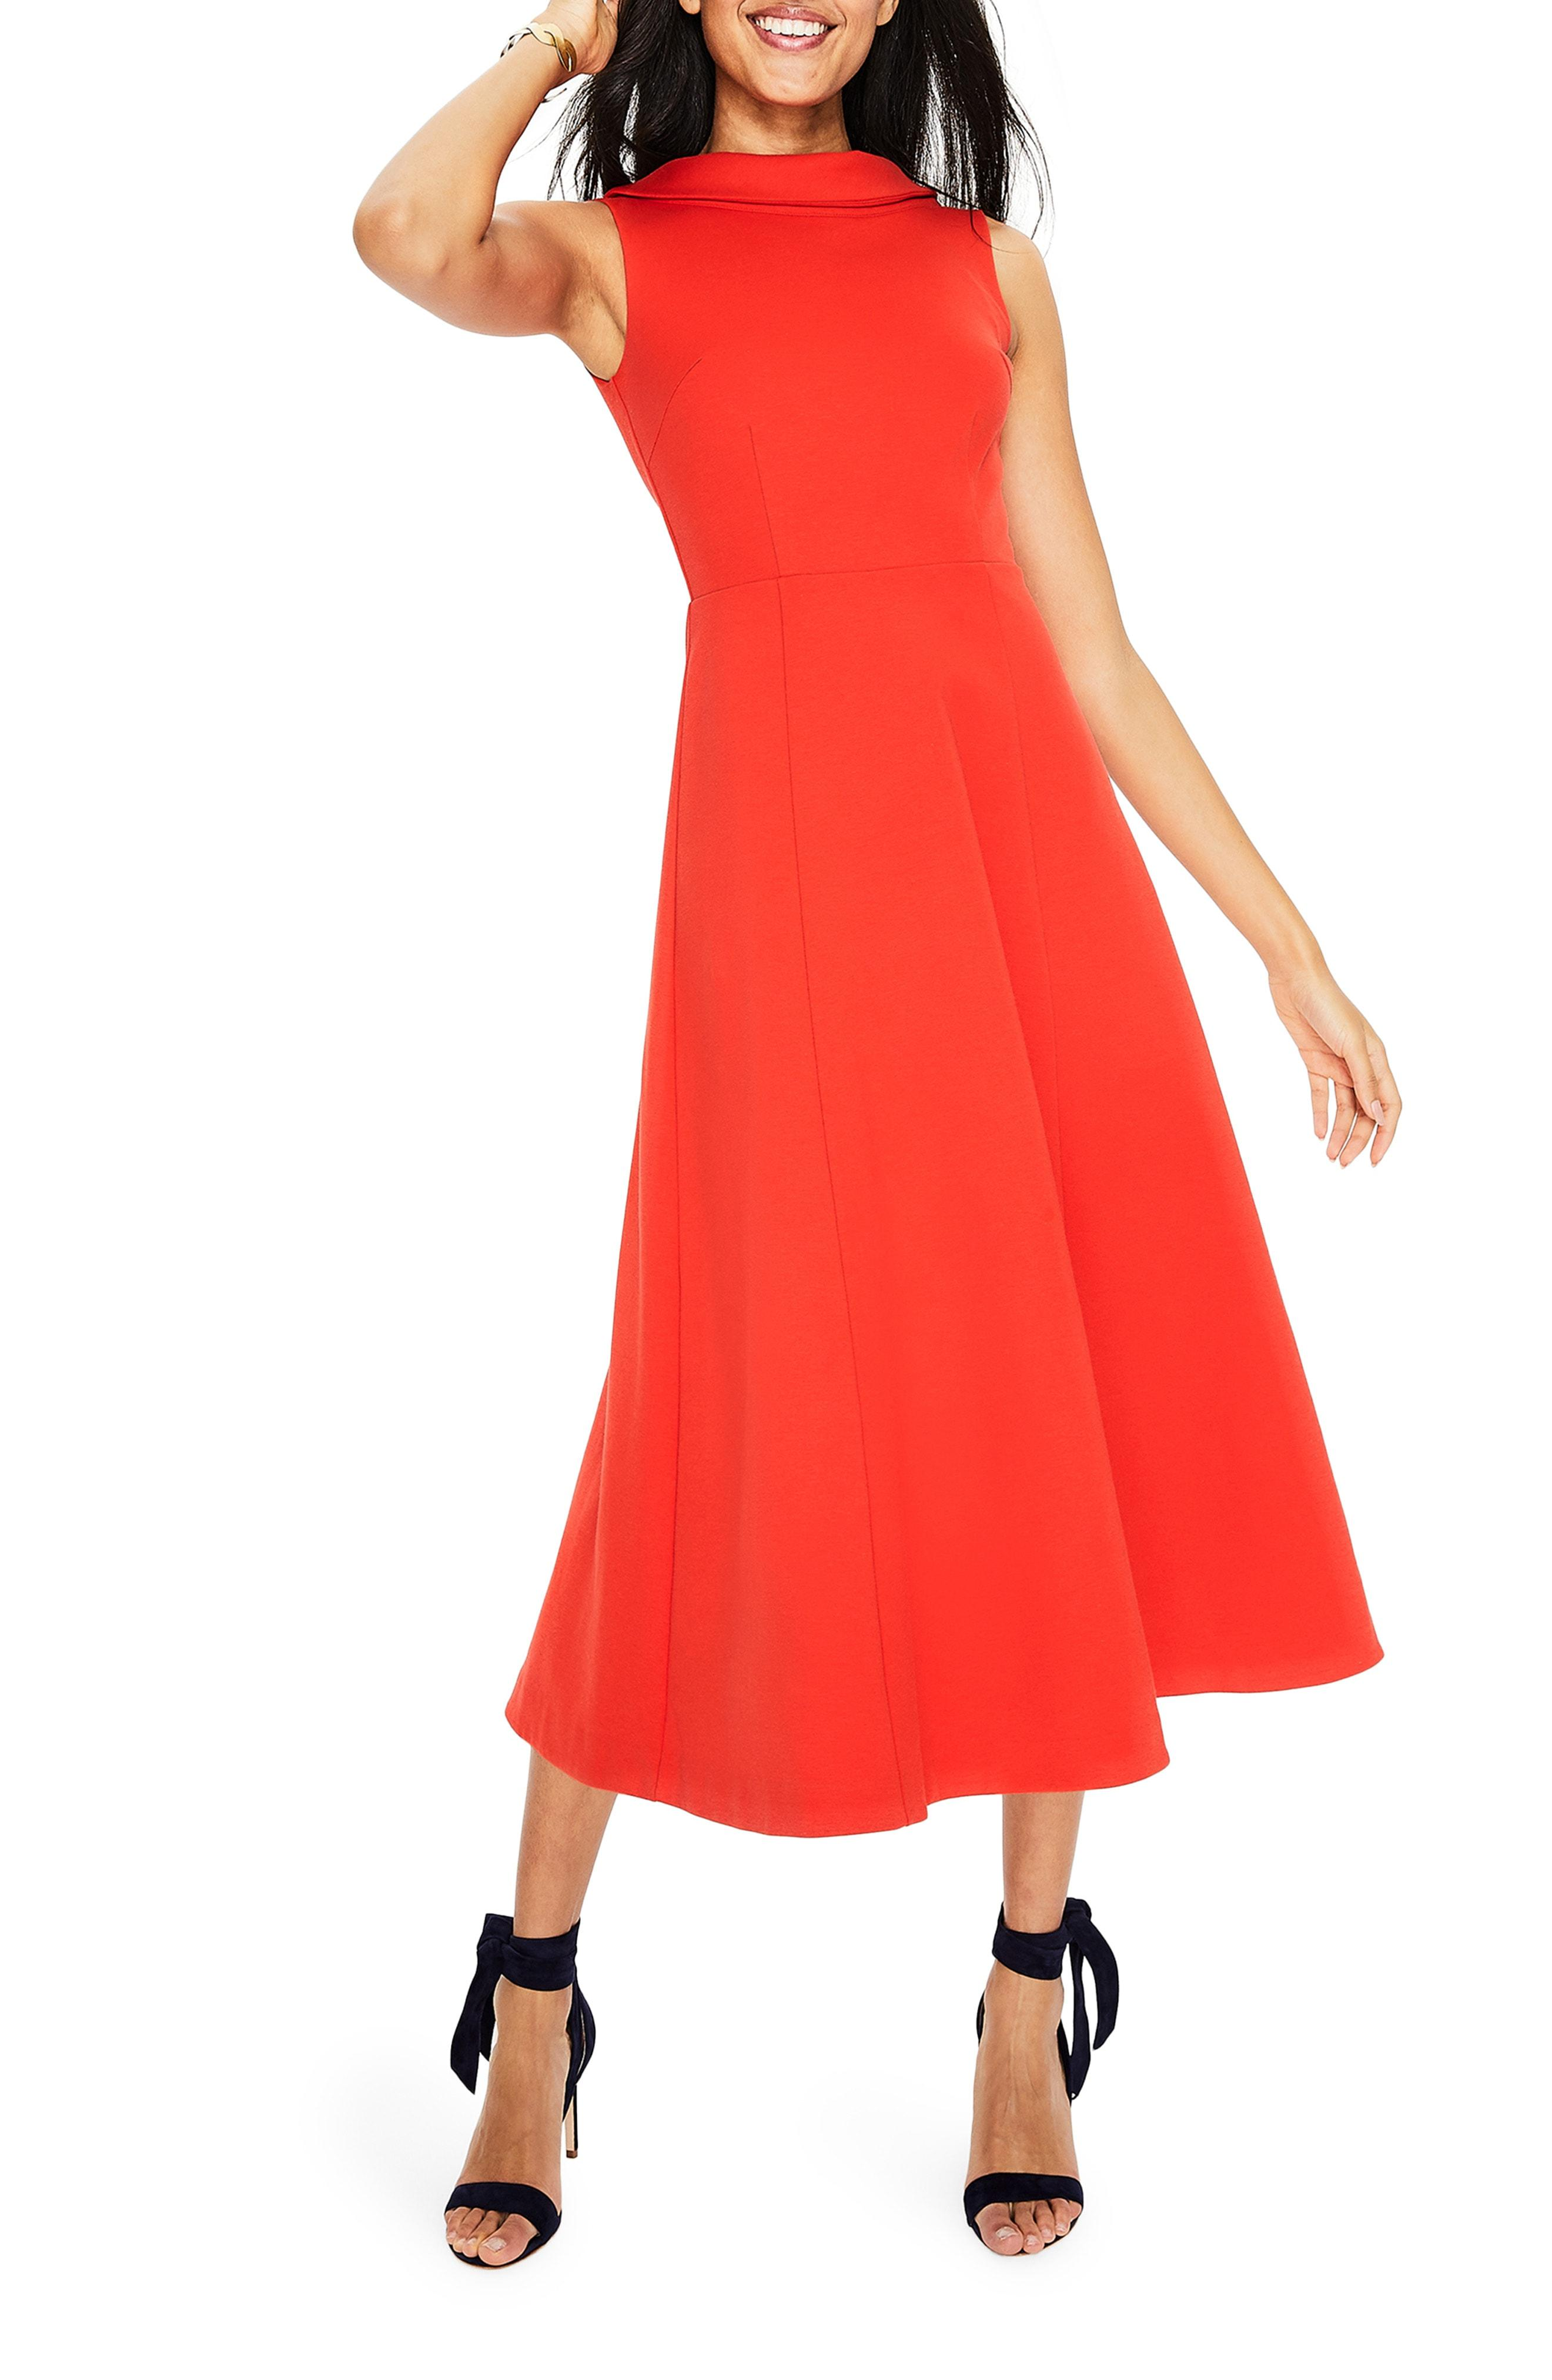 9d30ec5809c4 Lyst - Boden Aria Ponte Midi Dress in Red